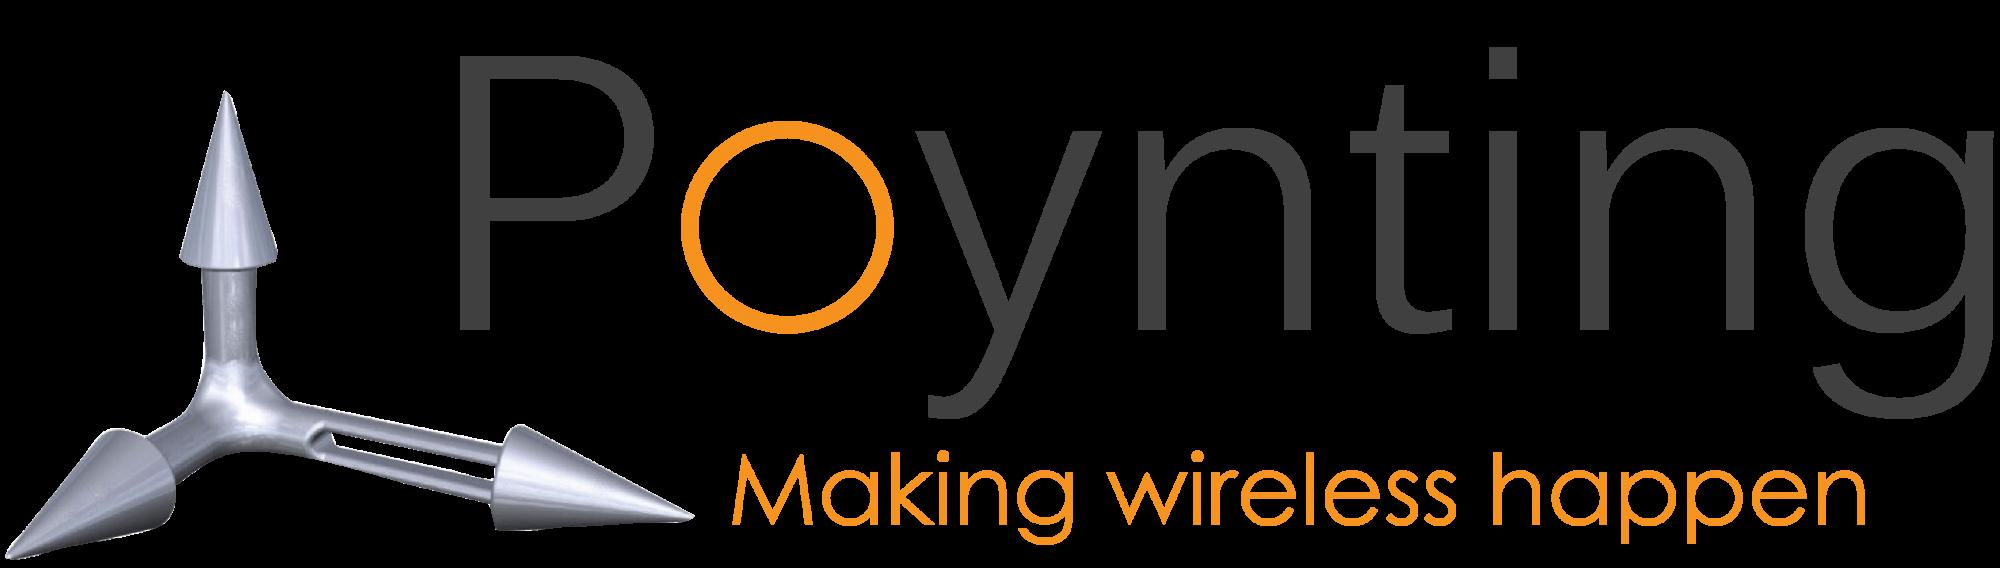 Poynting - Digital Skipper